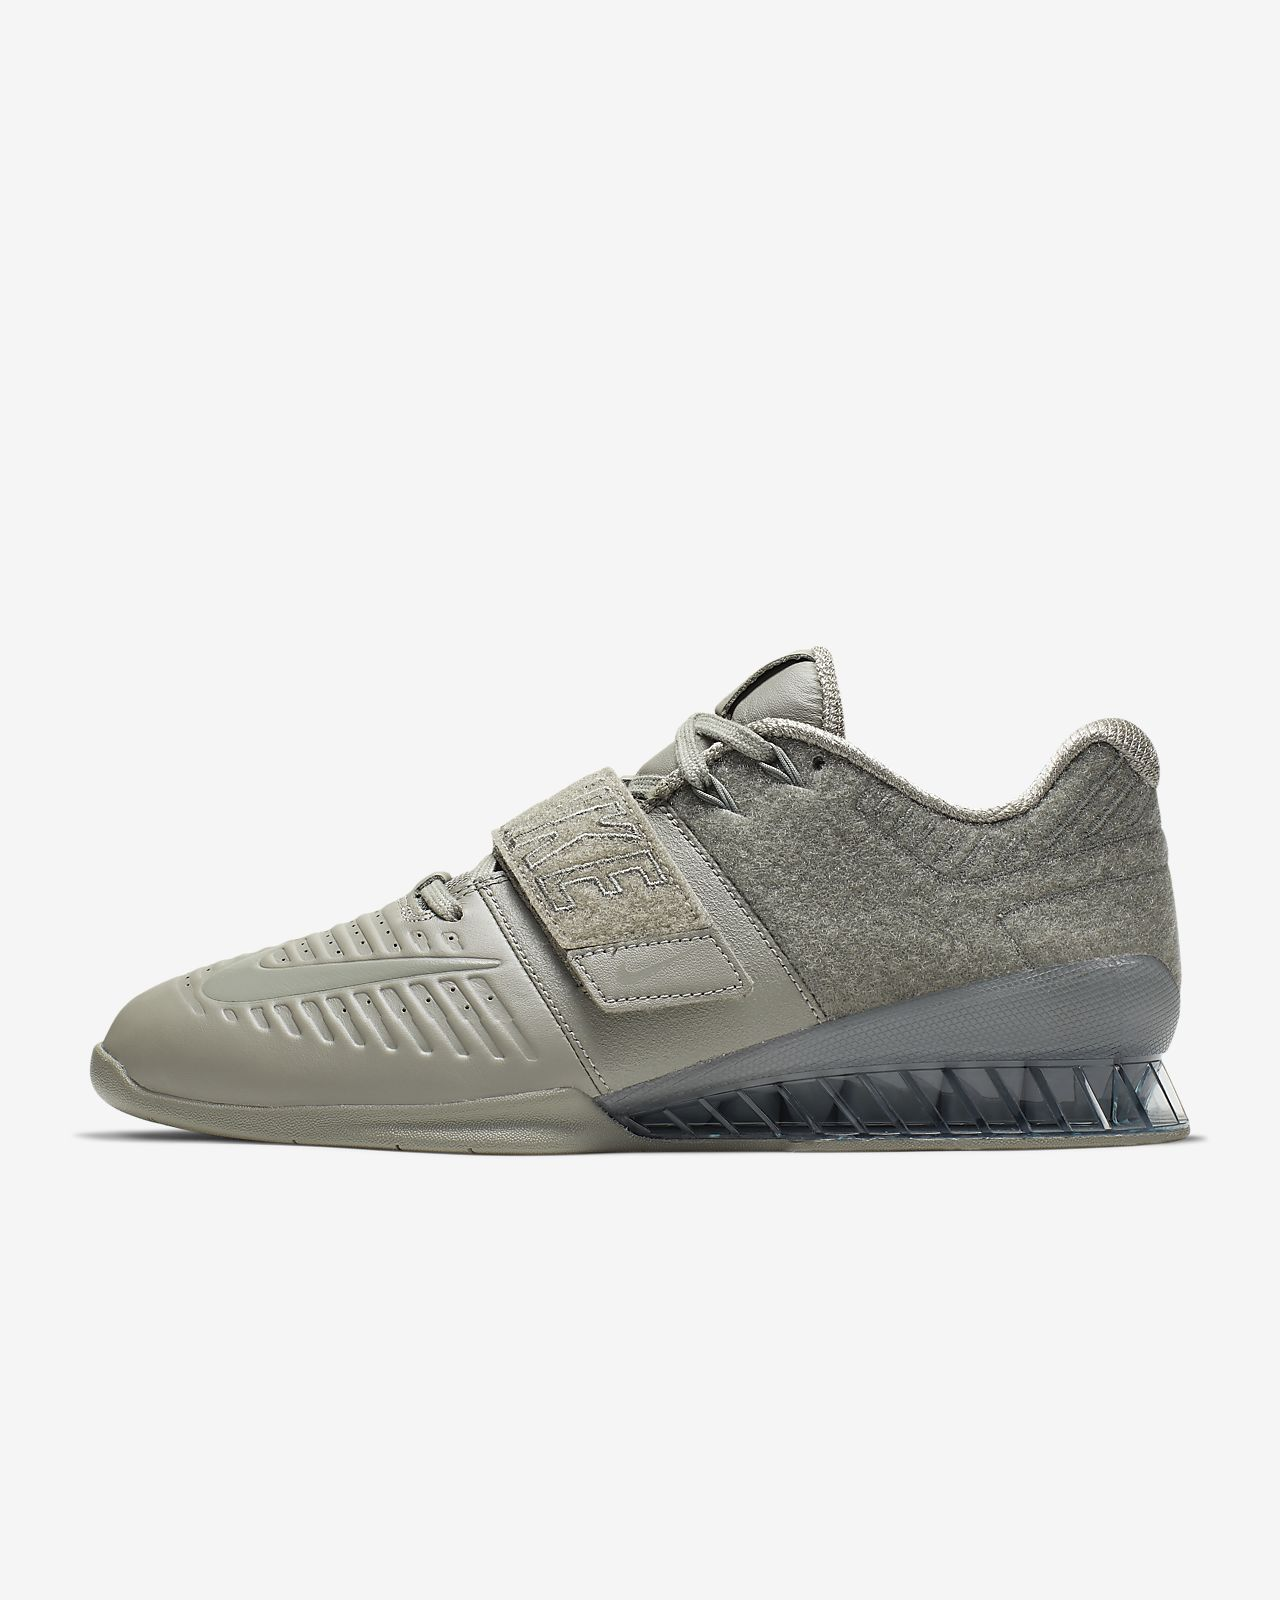 De Xd 3 Patch Nike Qrcxhdtsb Entrenamiento Romaleos